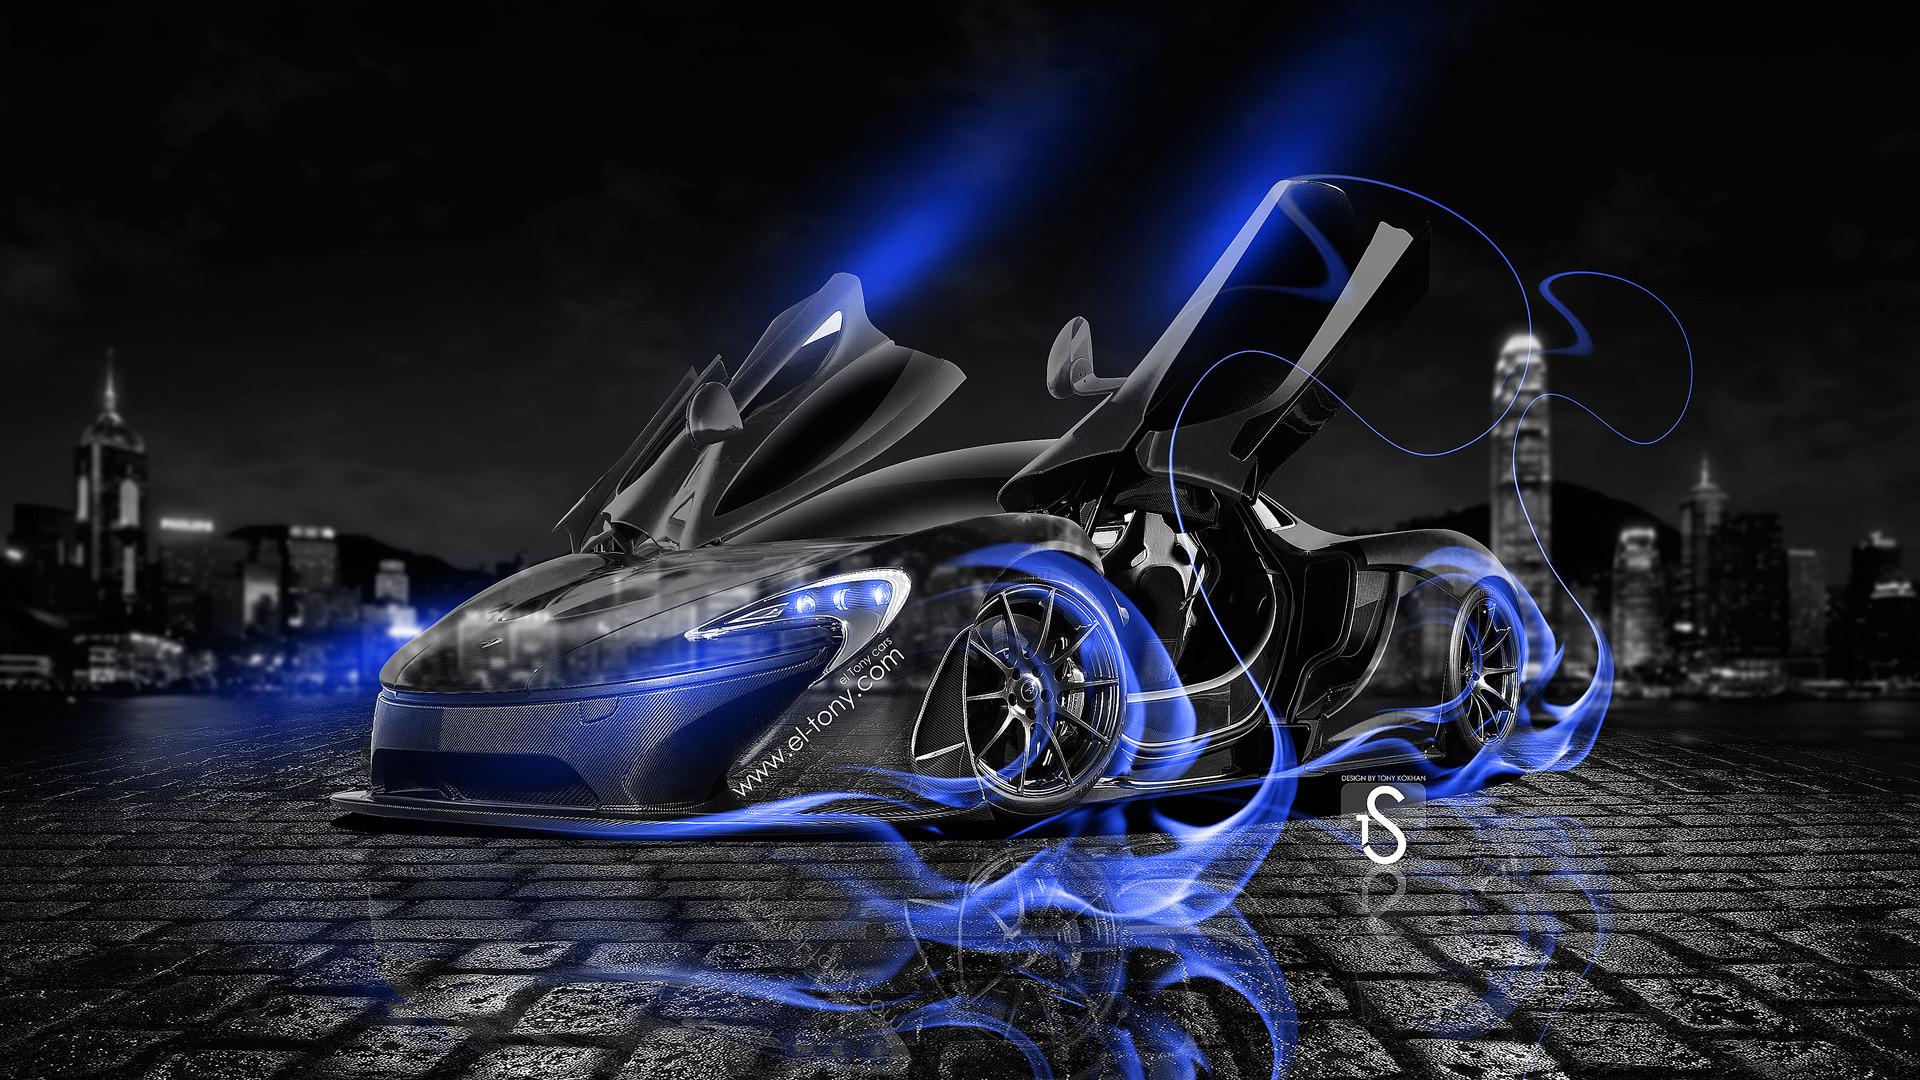 McLaren P1 GTR Blue Fire Abstract   ΣXΩTIC SUPΣRCARS ♚   Pinterest    Mclaren p1, Dream cars and Cars